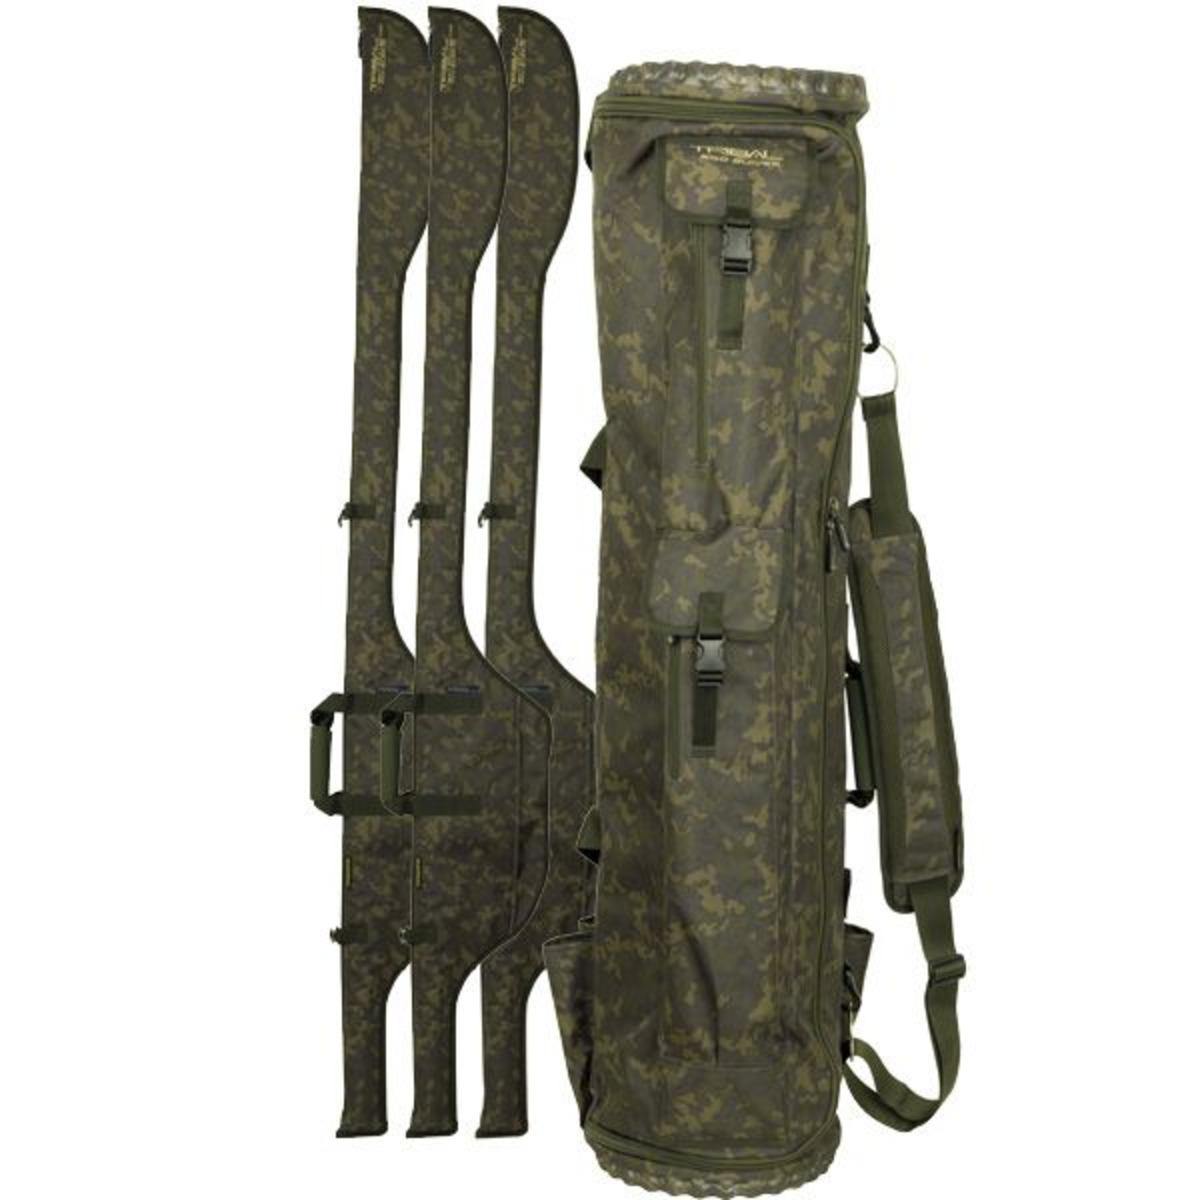 Shimano Tribal XTR 6 Rod Quiver - Single 10 ft-11 ft - 30 x 130 cm-L=210 cm